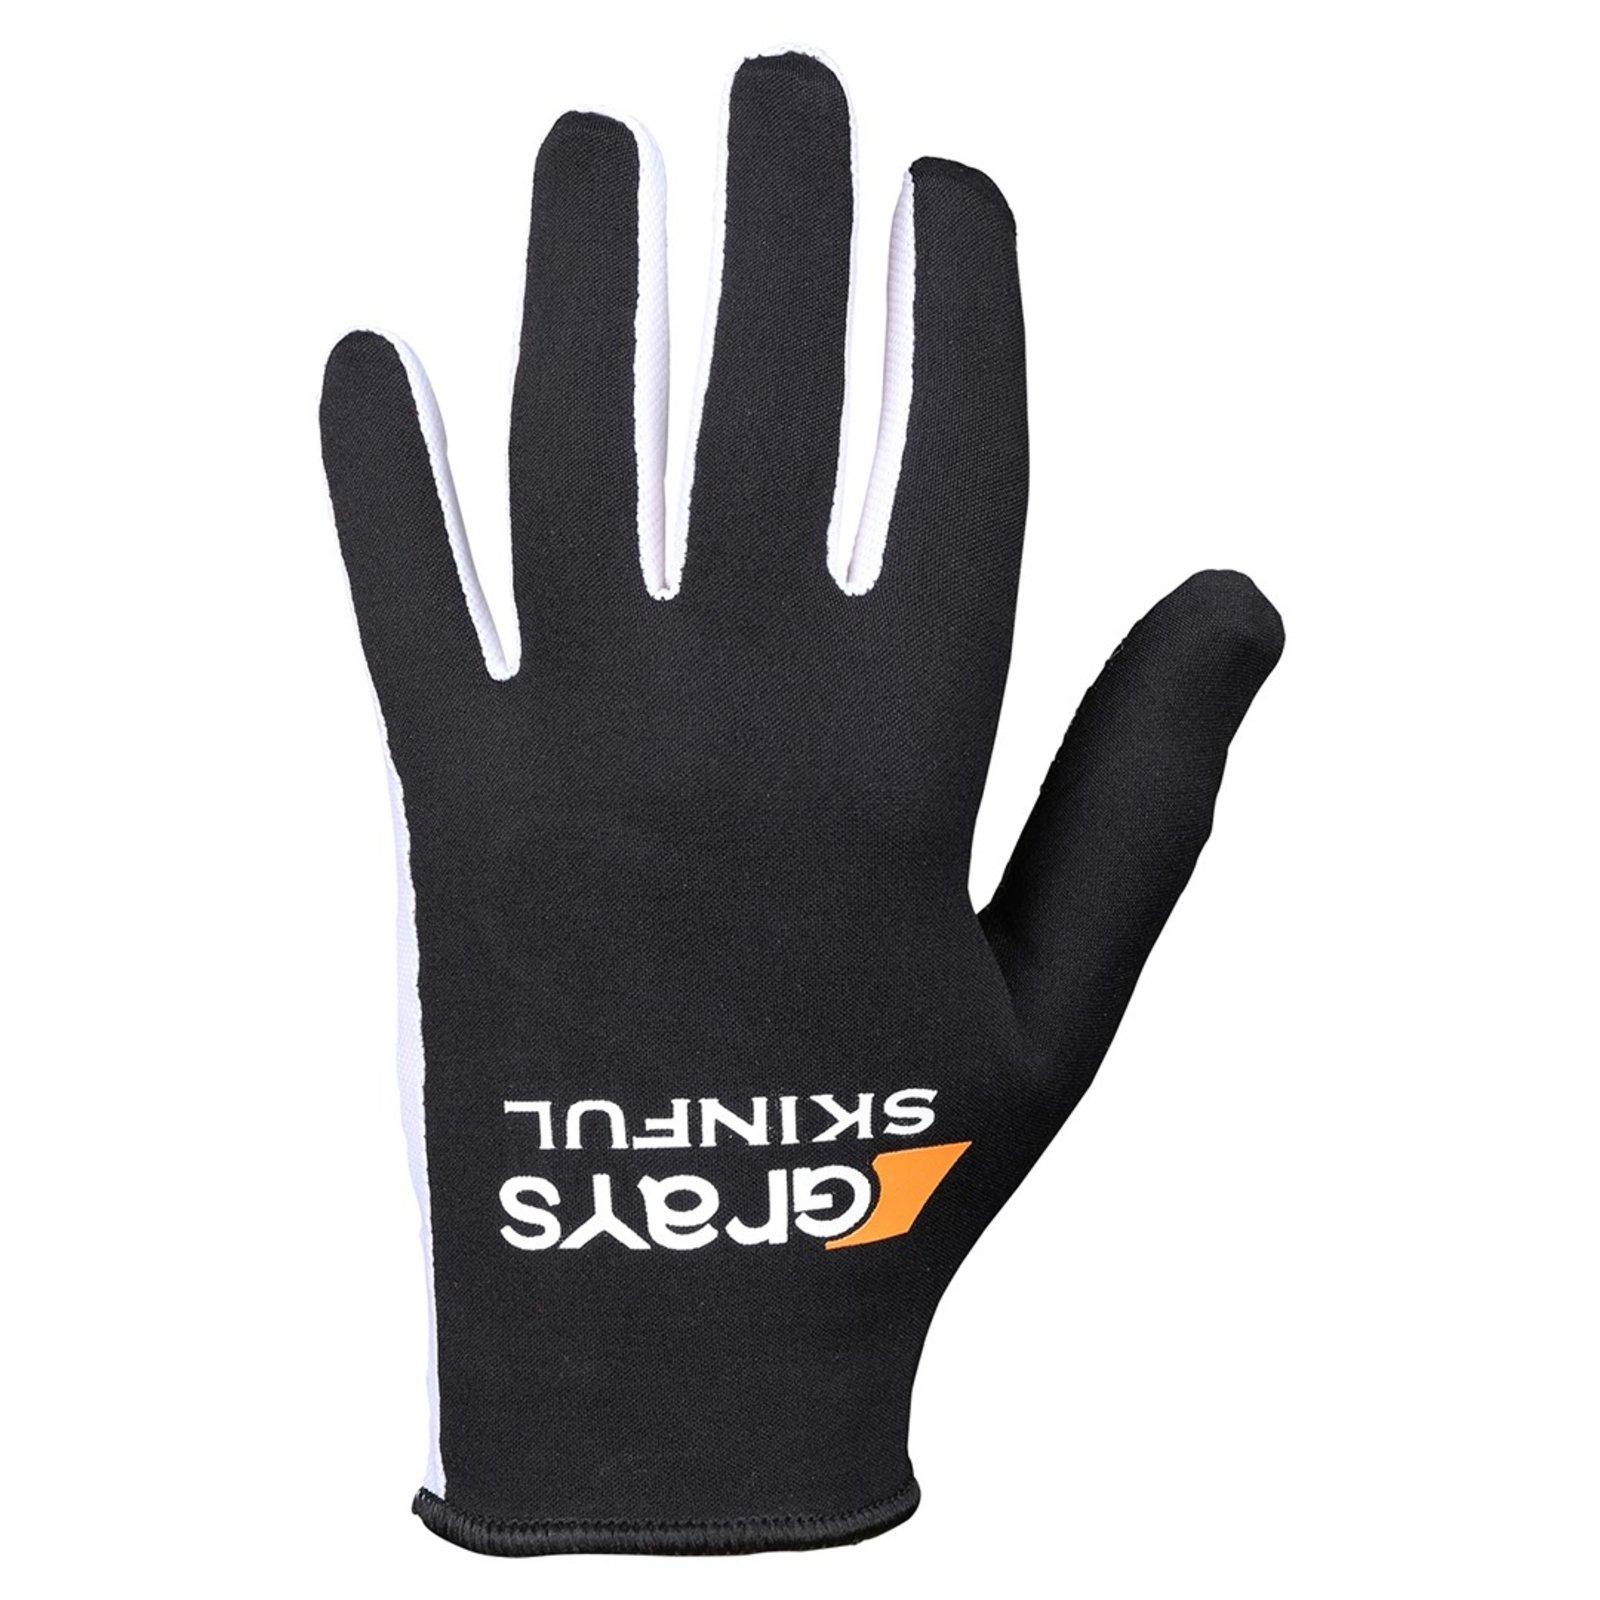 Grays Mens Skinful Hockey Gloves Black Sports Training Accessory